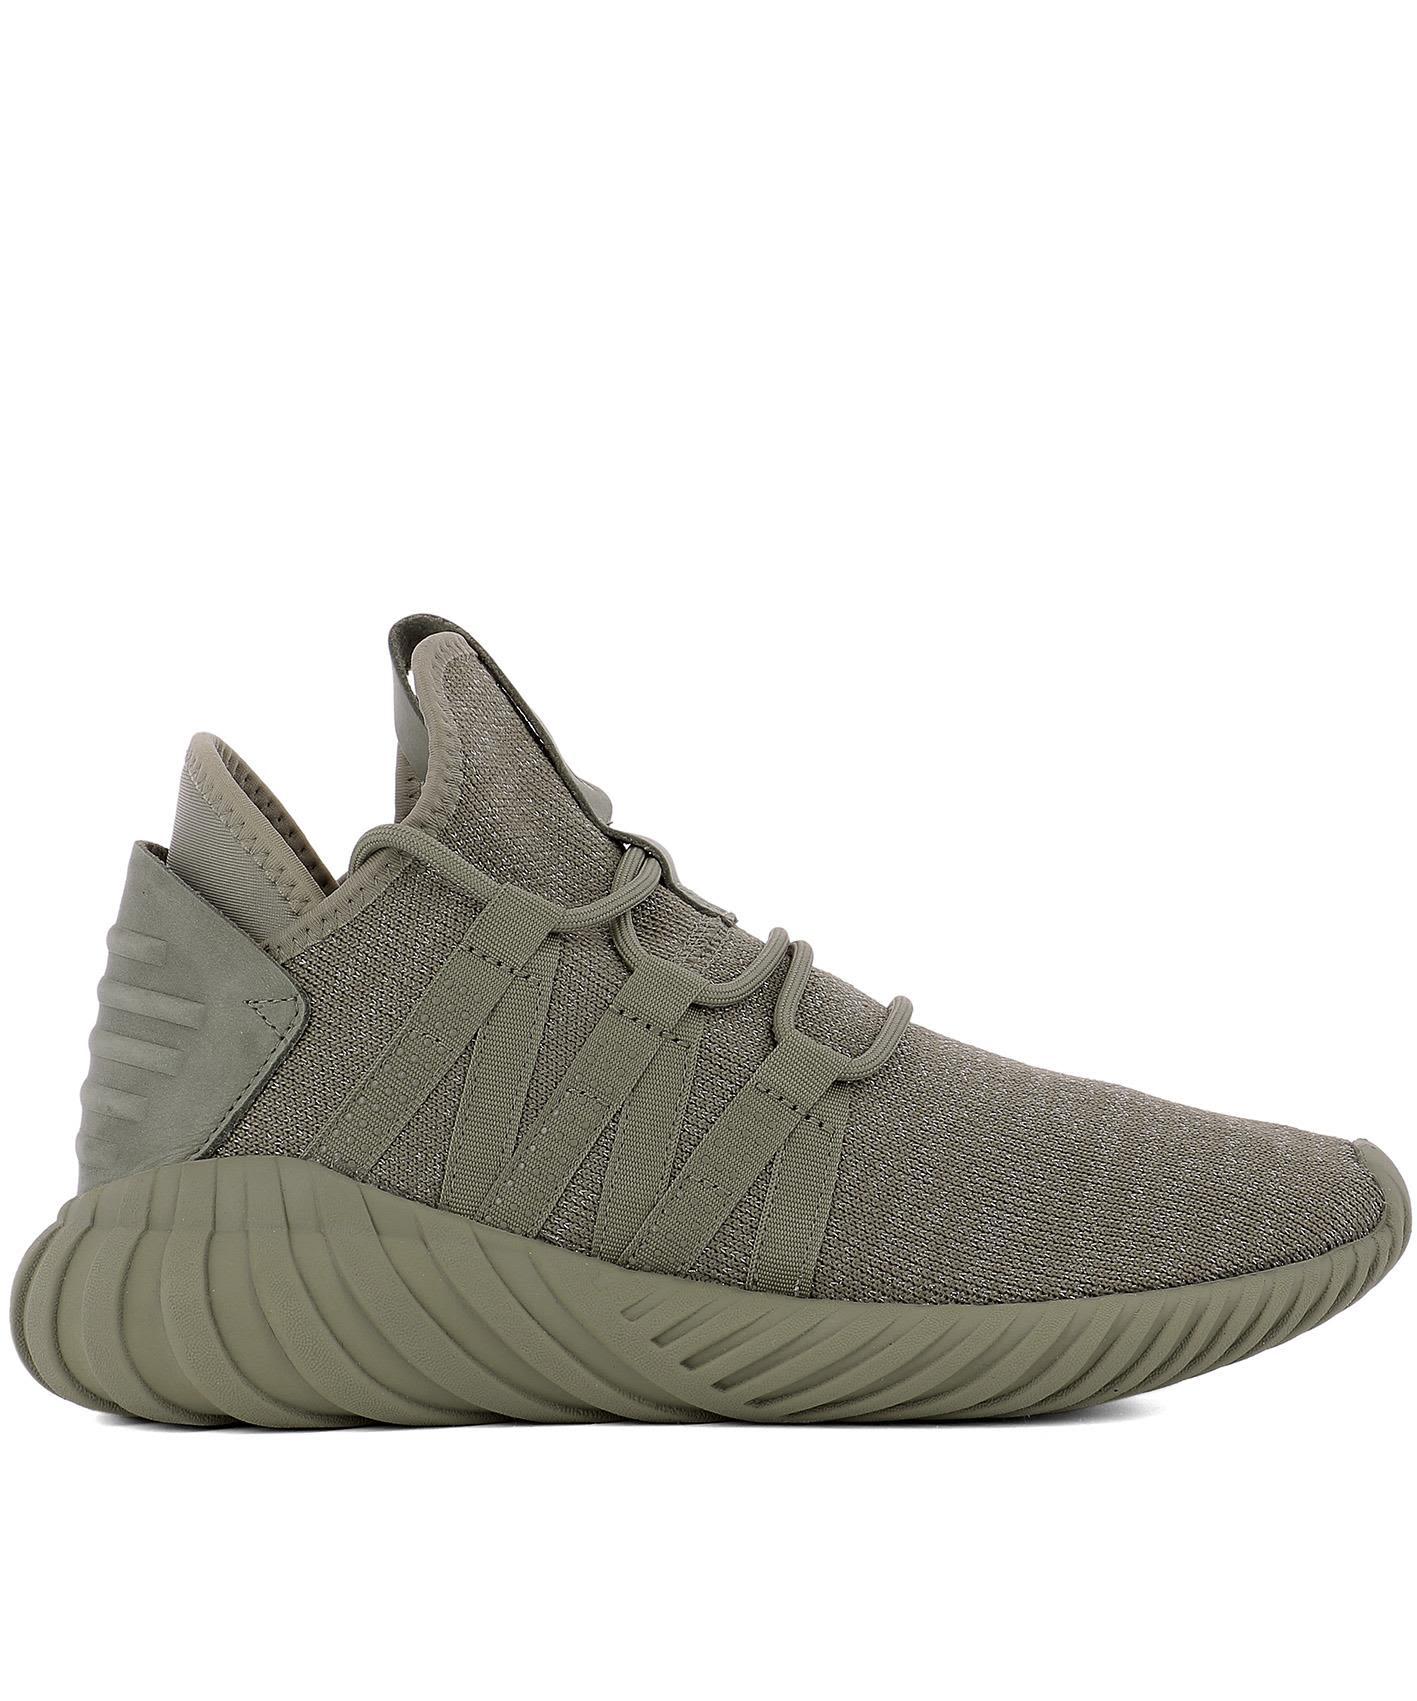 Fabric TUBULAR DAWN Sneakers Spring/summer adidas hwTpb